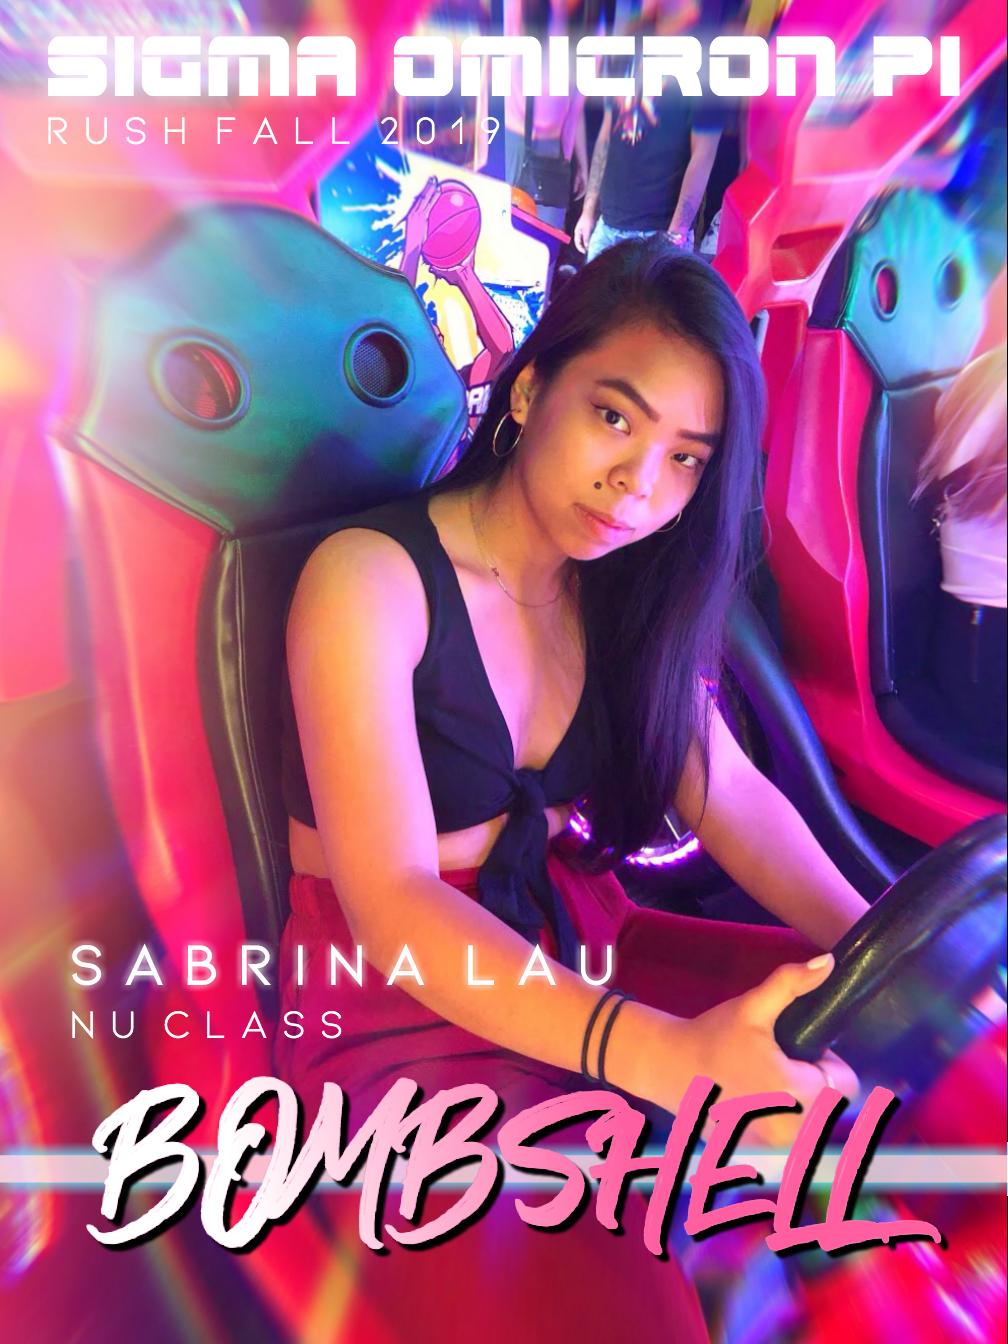 Sabrina Lau